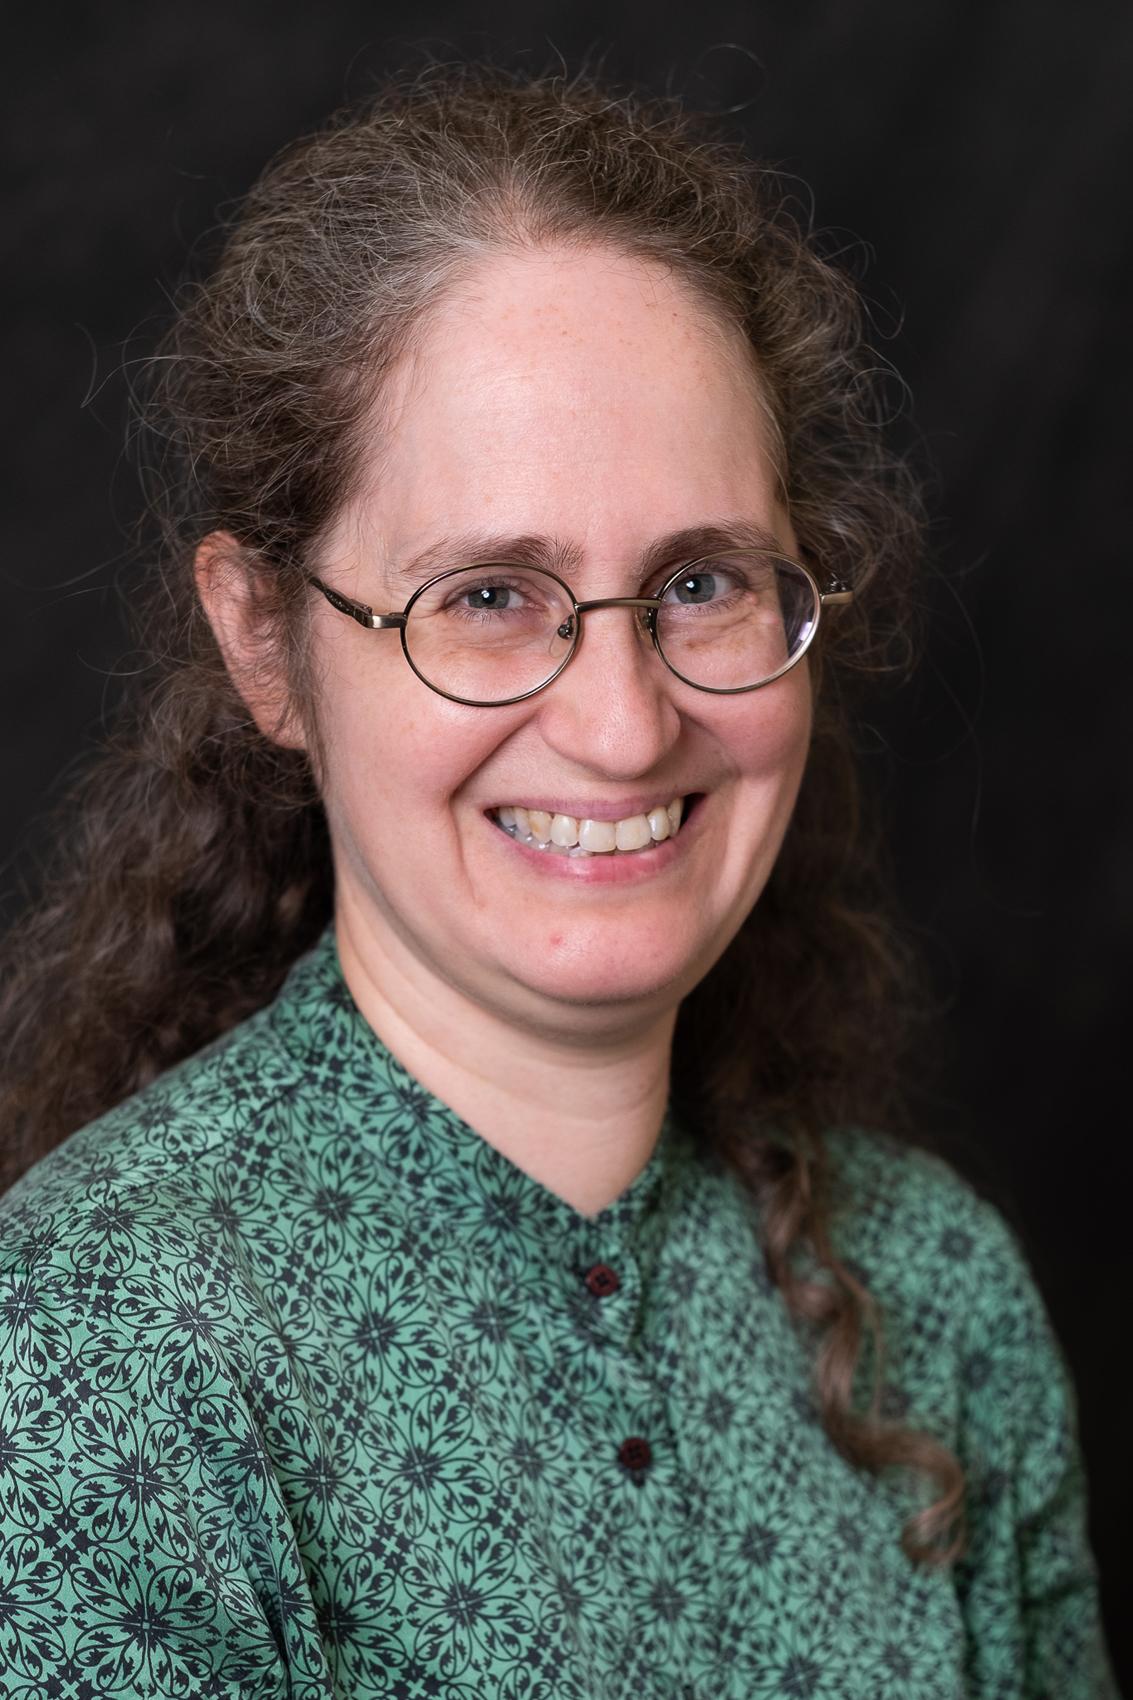 Dr. Sarah Bradshaw